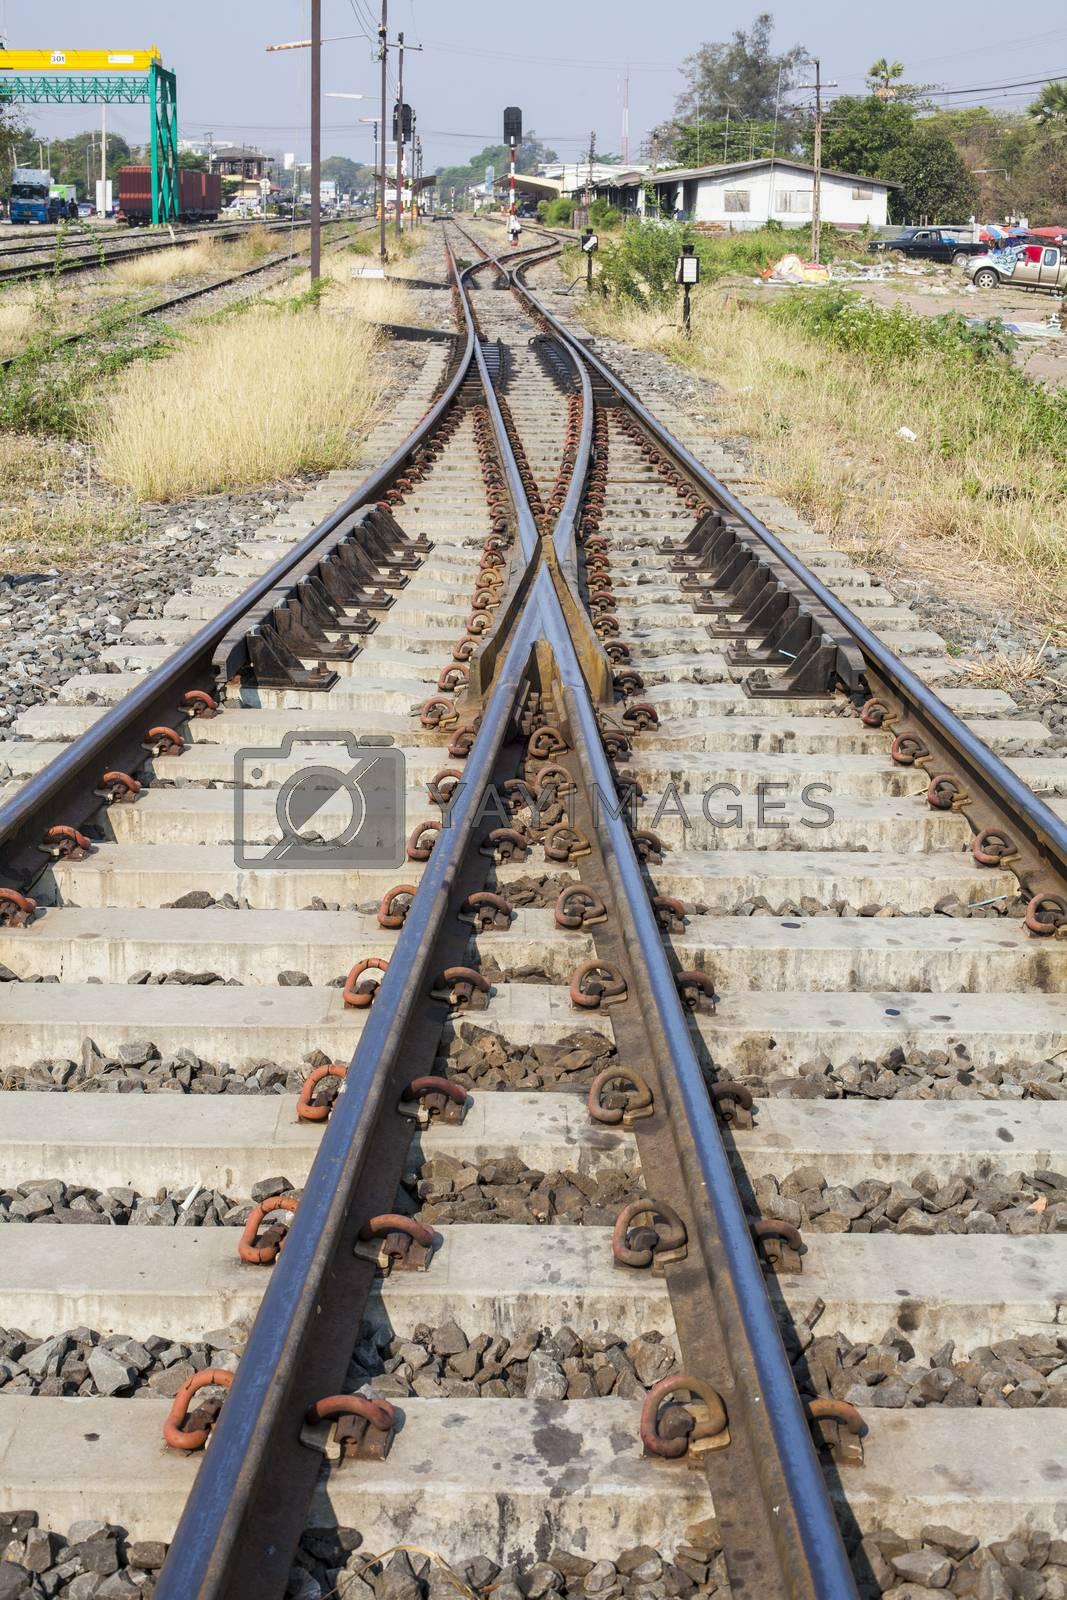 Railroad tracks at a train station